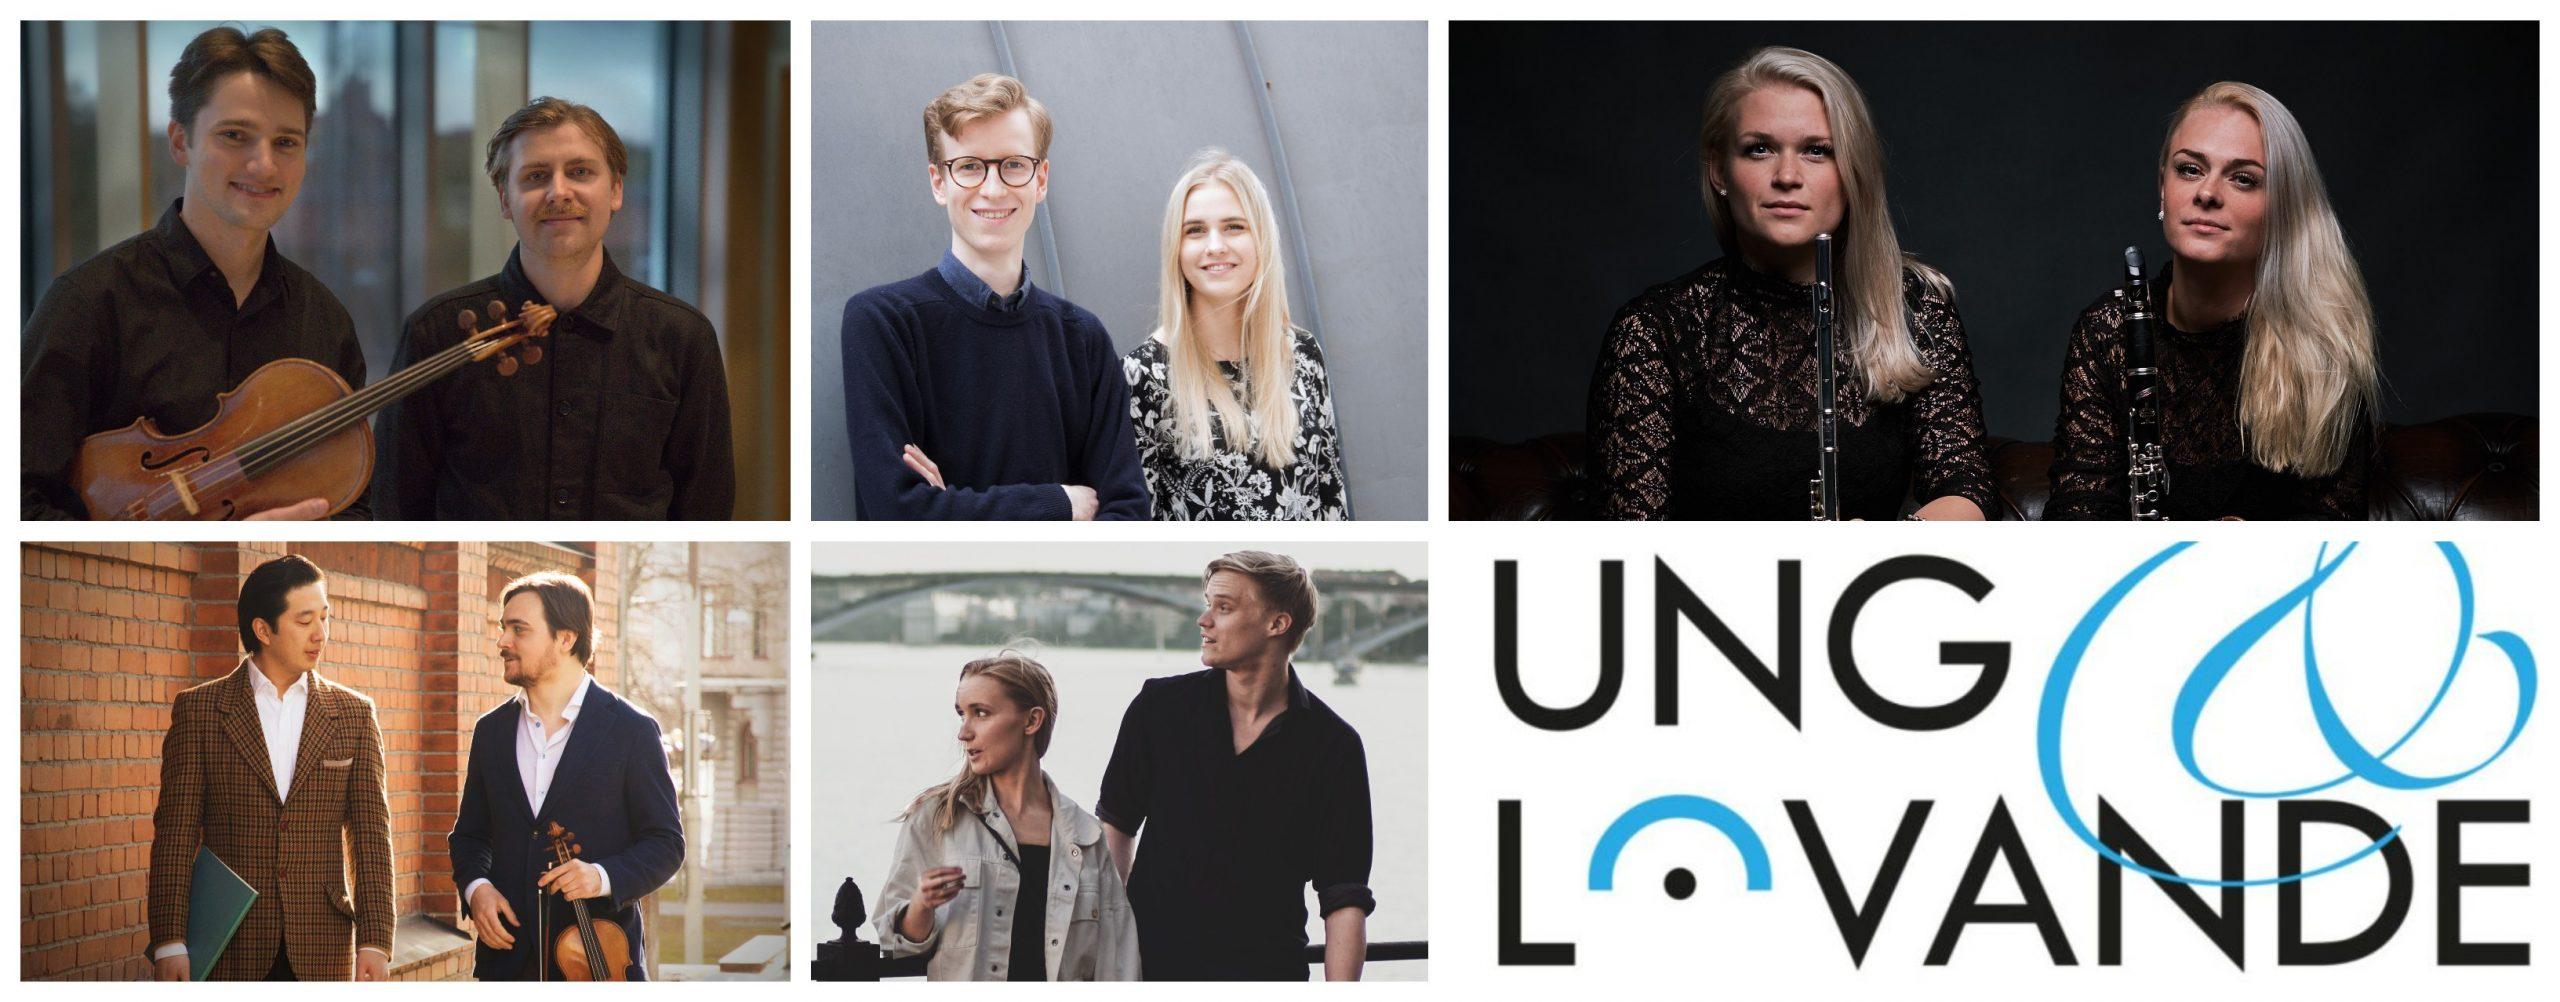 Sextonde biennalen blir digital